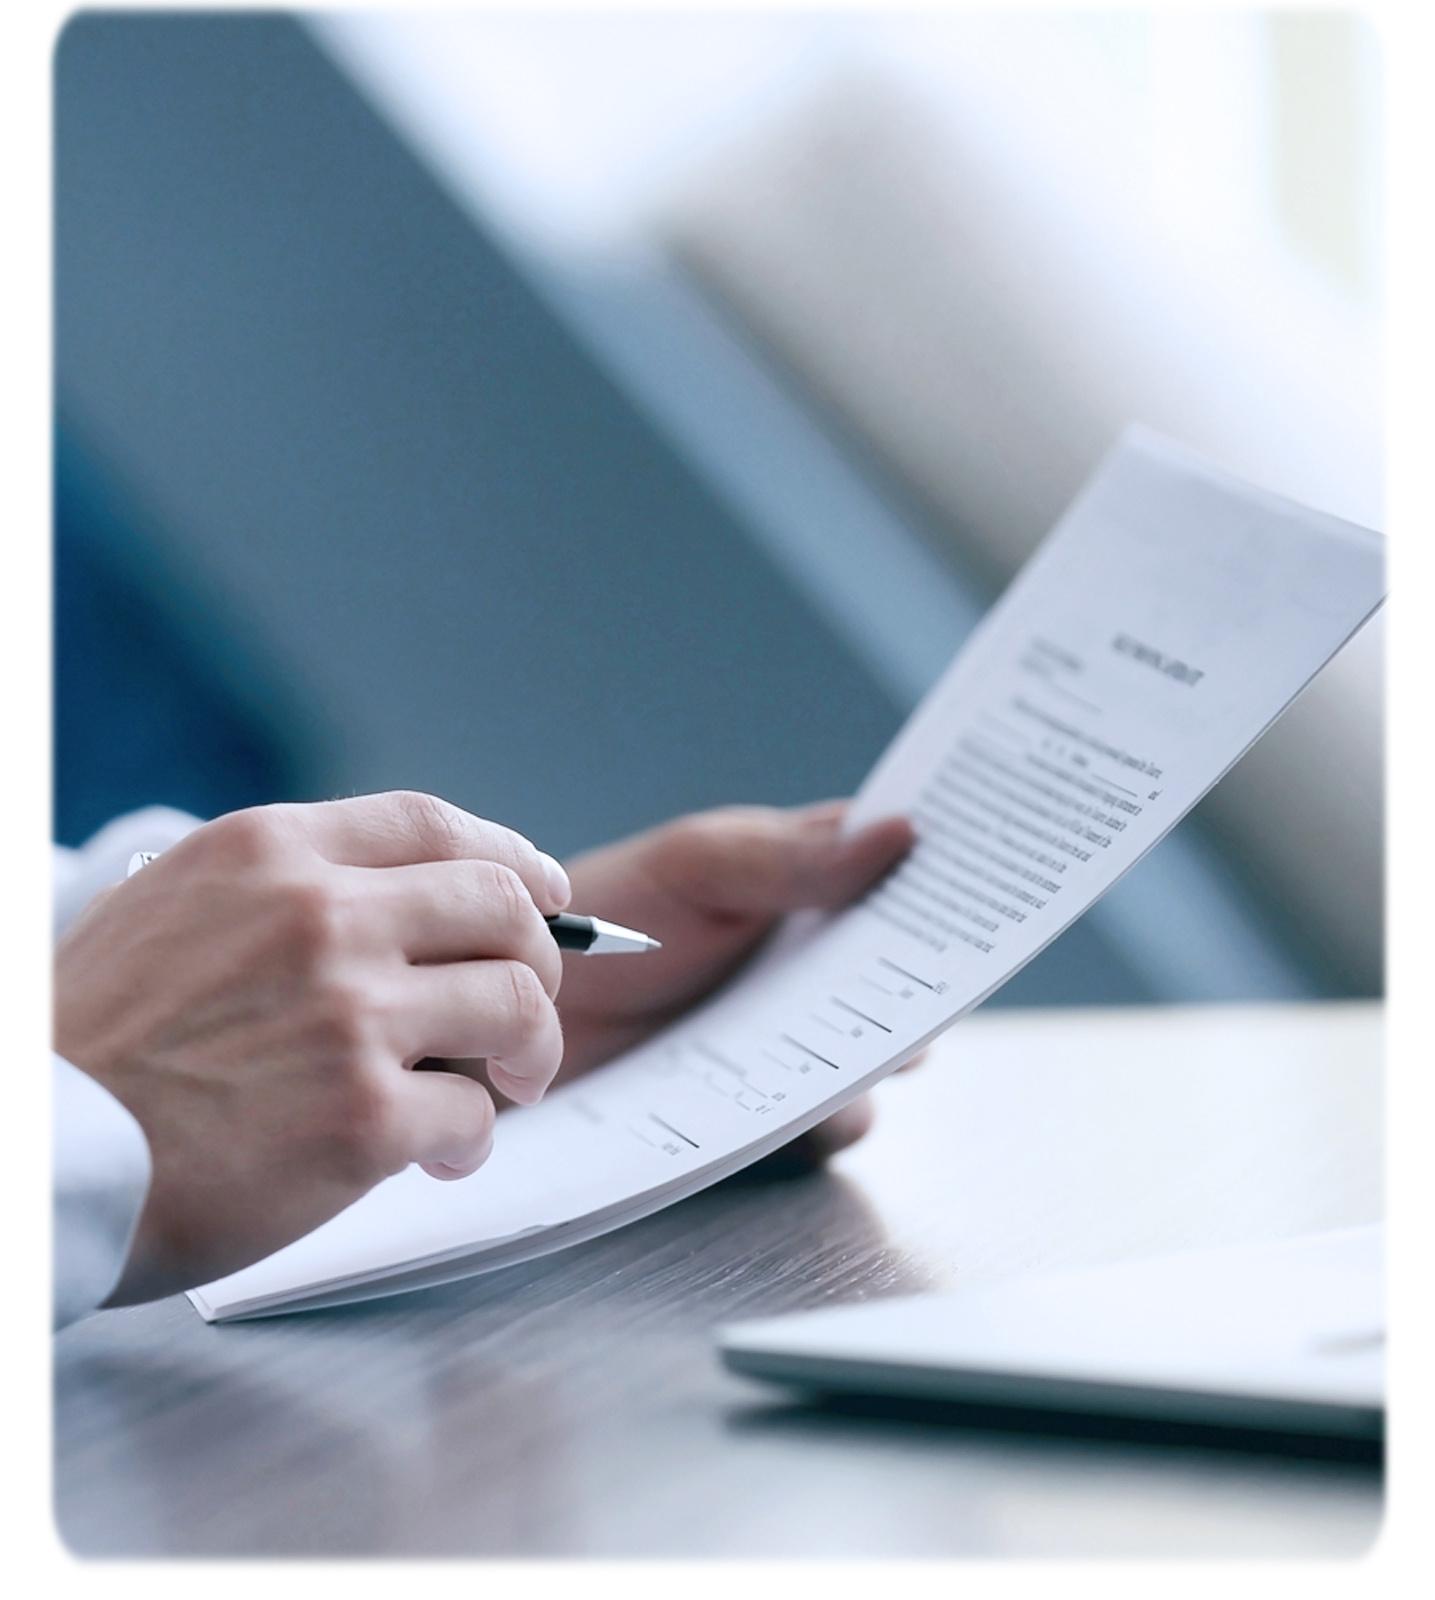 fleetPro_B2B_energieversorger_Compliance